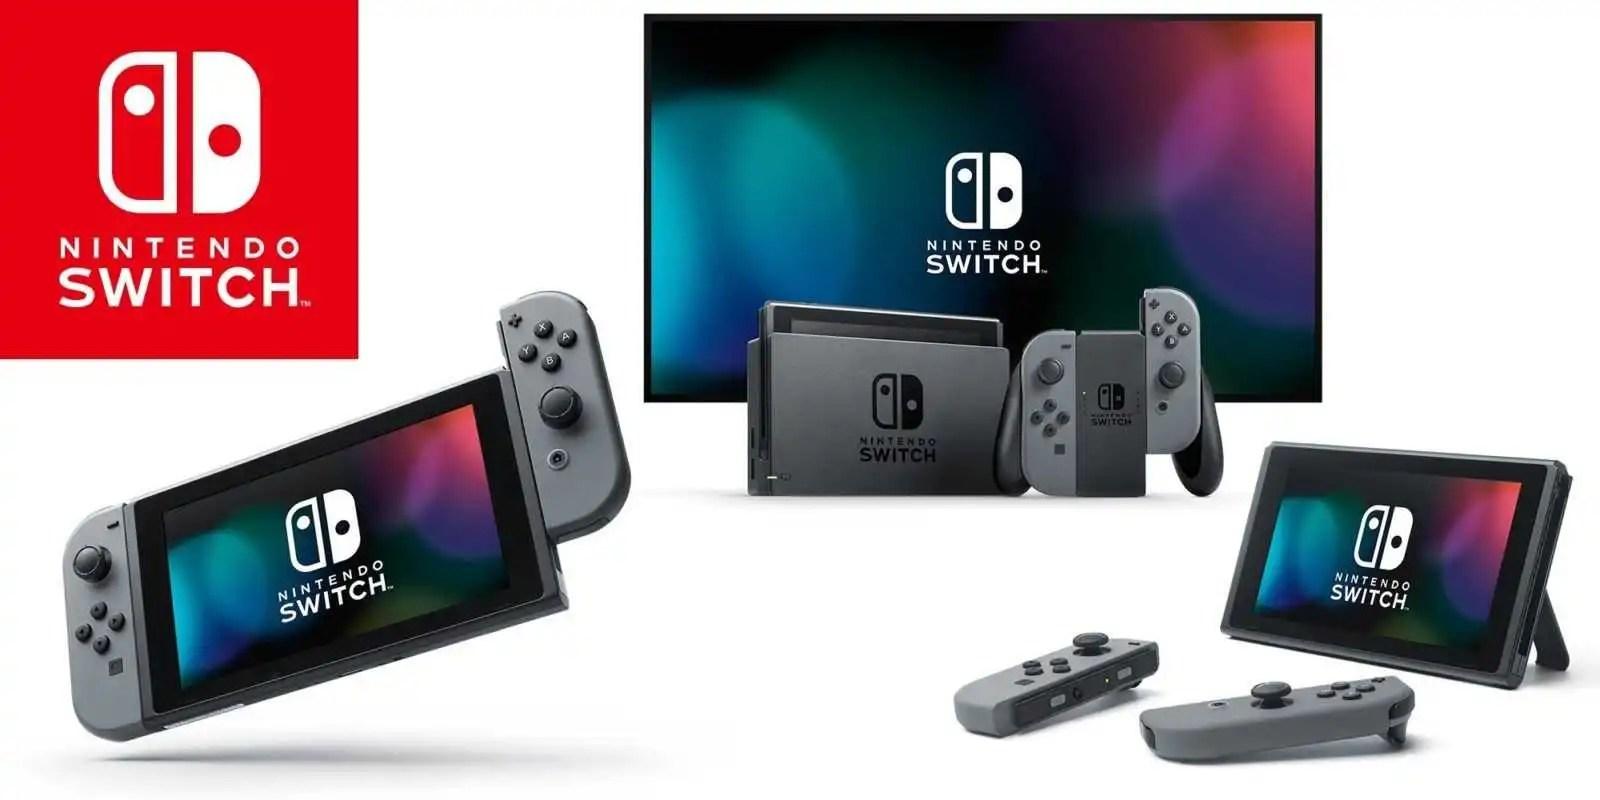 Reggie Fils Aime Nintendo Switch non rimpiazzerà 3DS